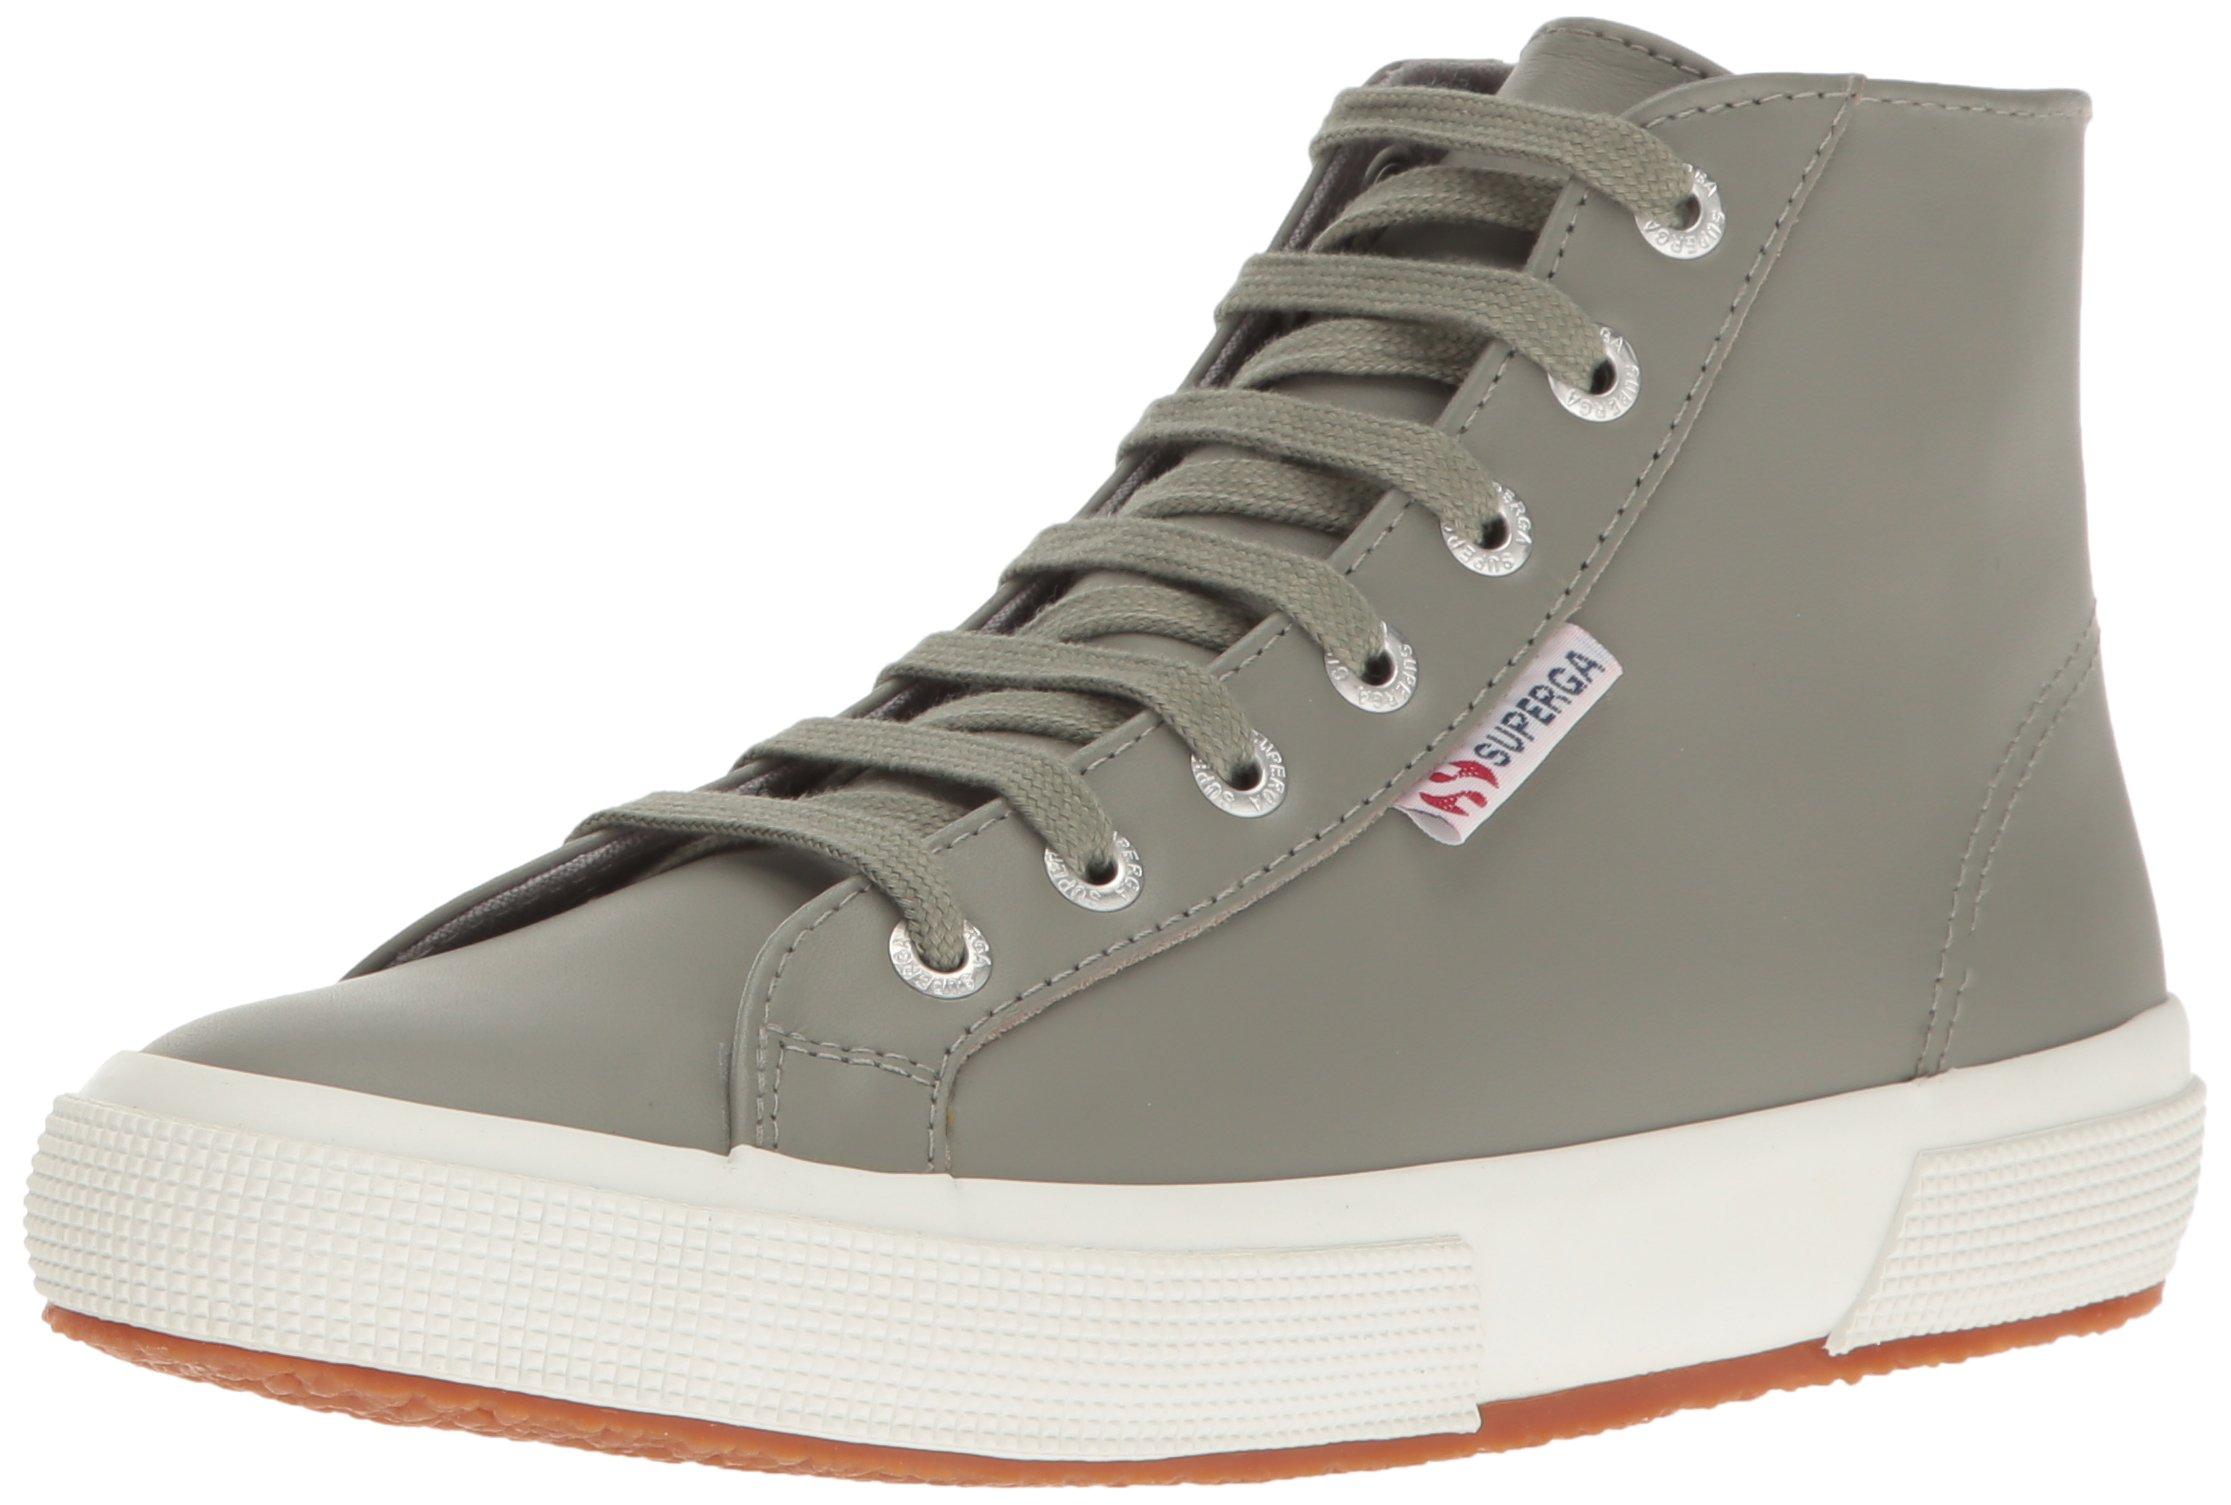 Superga Women's 2795 Fglu Fashion Sneaker, Grey Sage, 41 EU/9.5 M US